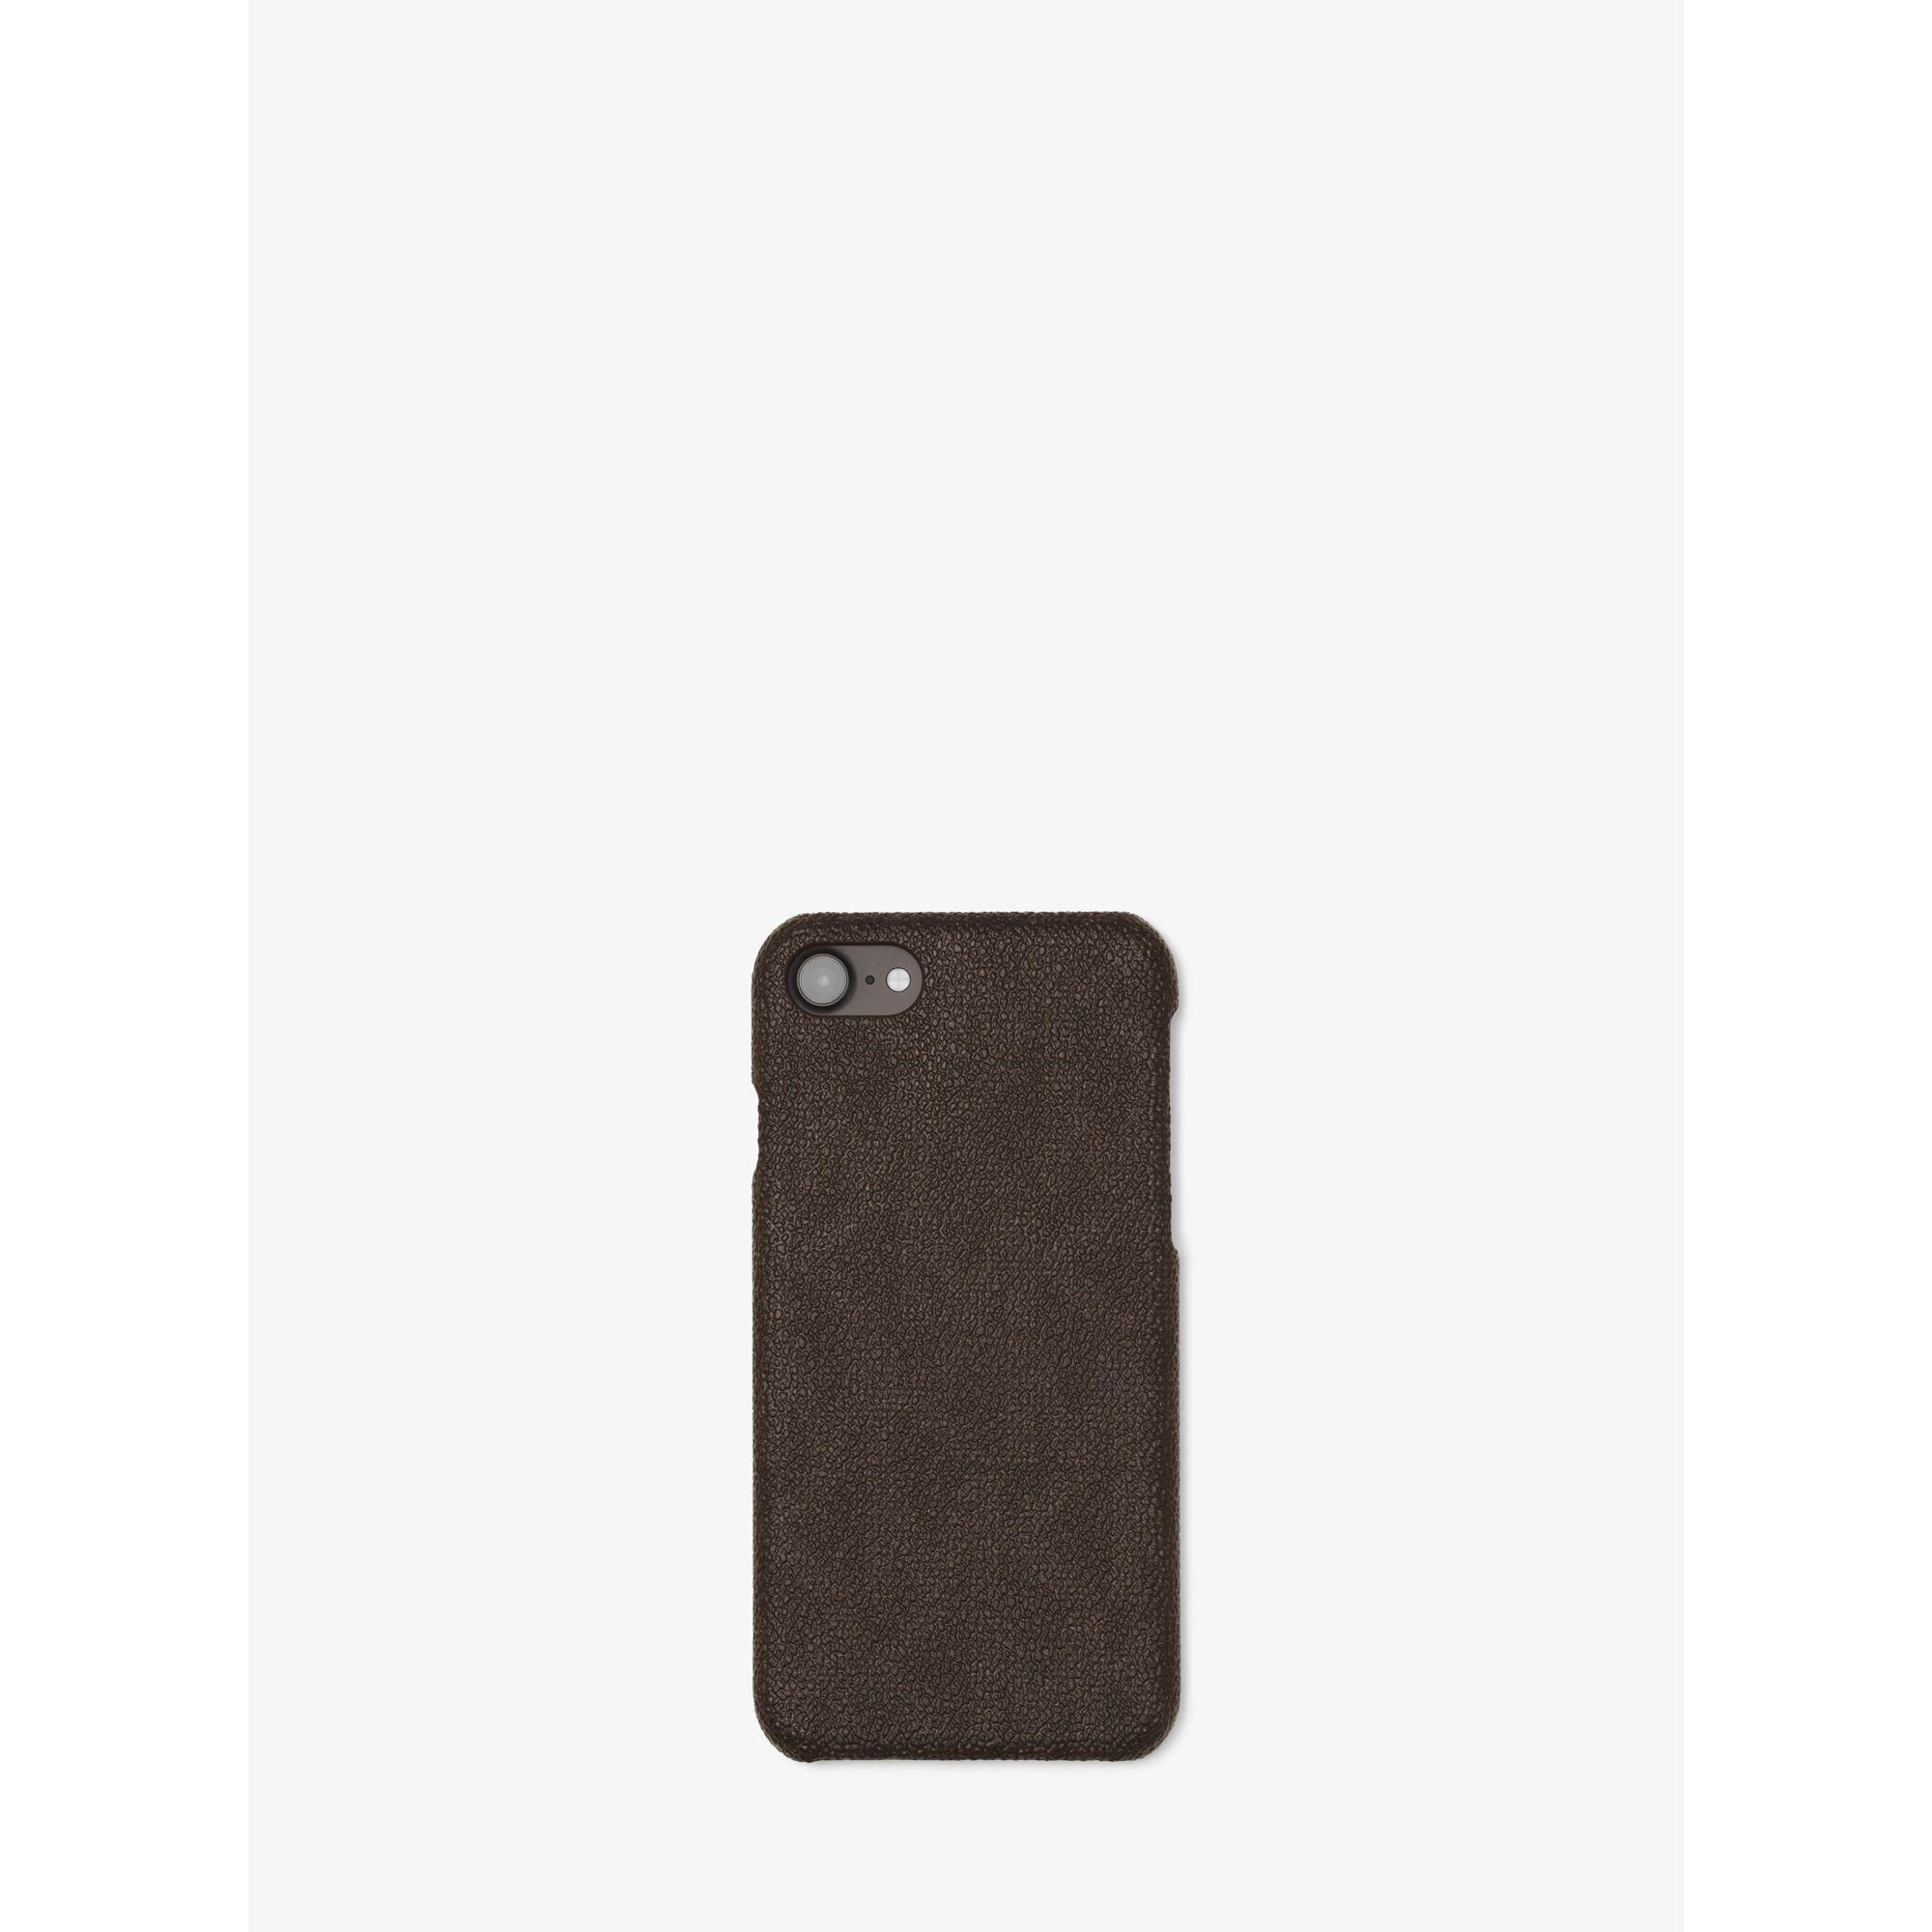 michael kors logo smartphone case for iphone 7 in brown lyst. Black Bedroom Furniture Sets. Home Design Ideas